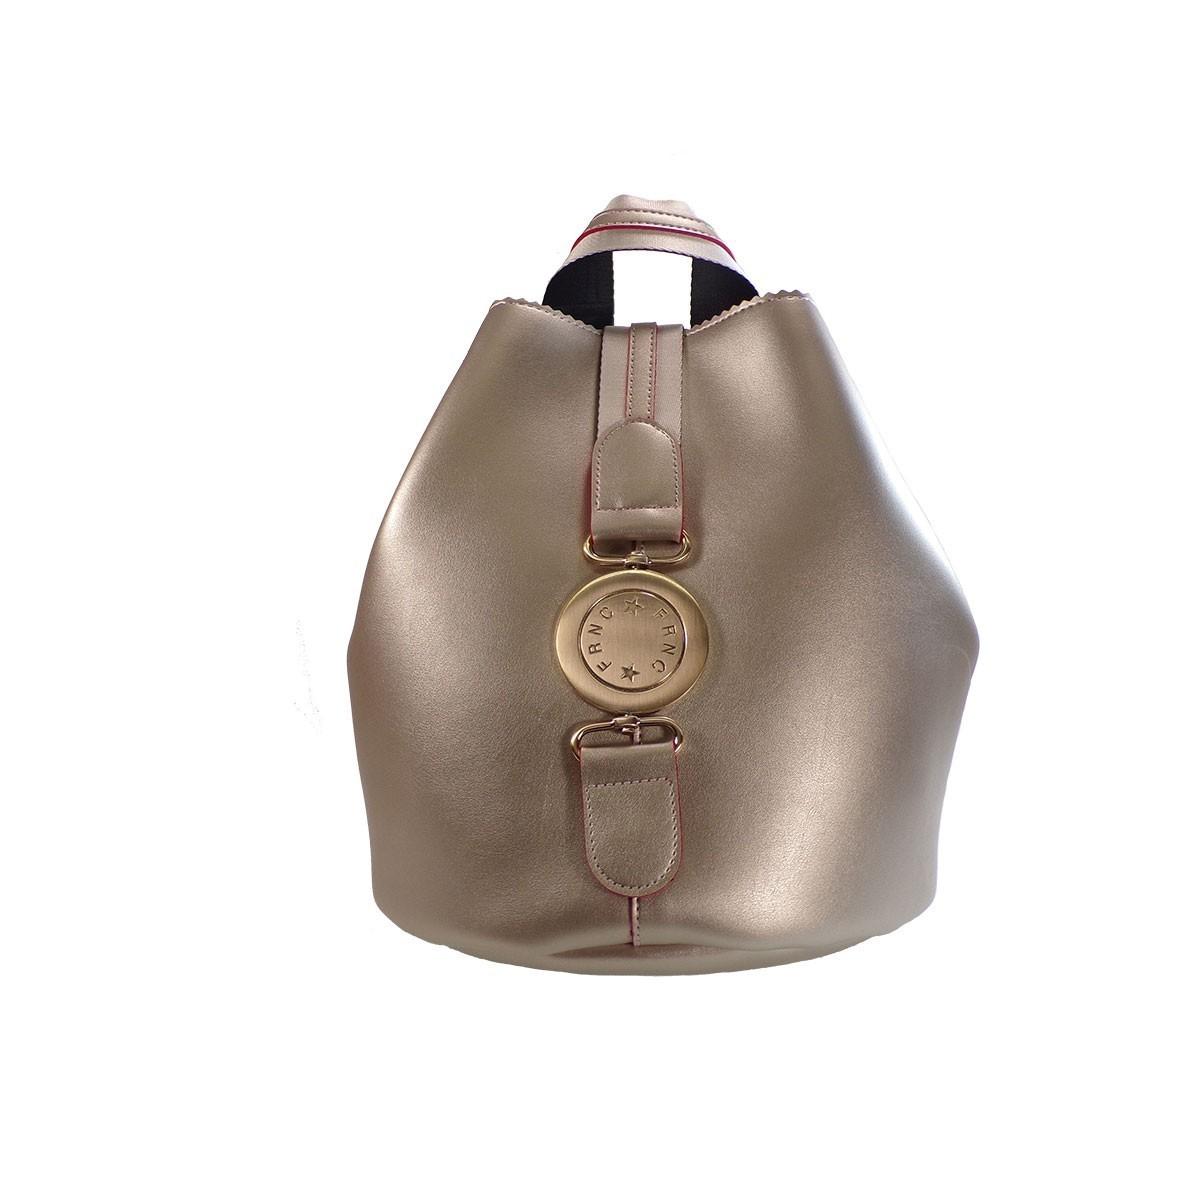 c505a3d7e9 FRNC FRANCESCO Τσάντα Γυναικεία Πλάτης-Backpack 562 Πλατίνα Δέρμα ...